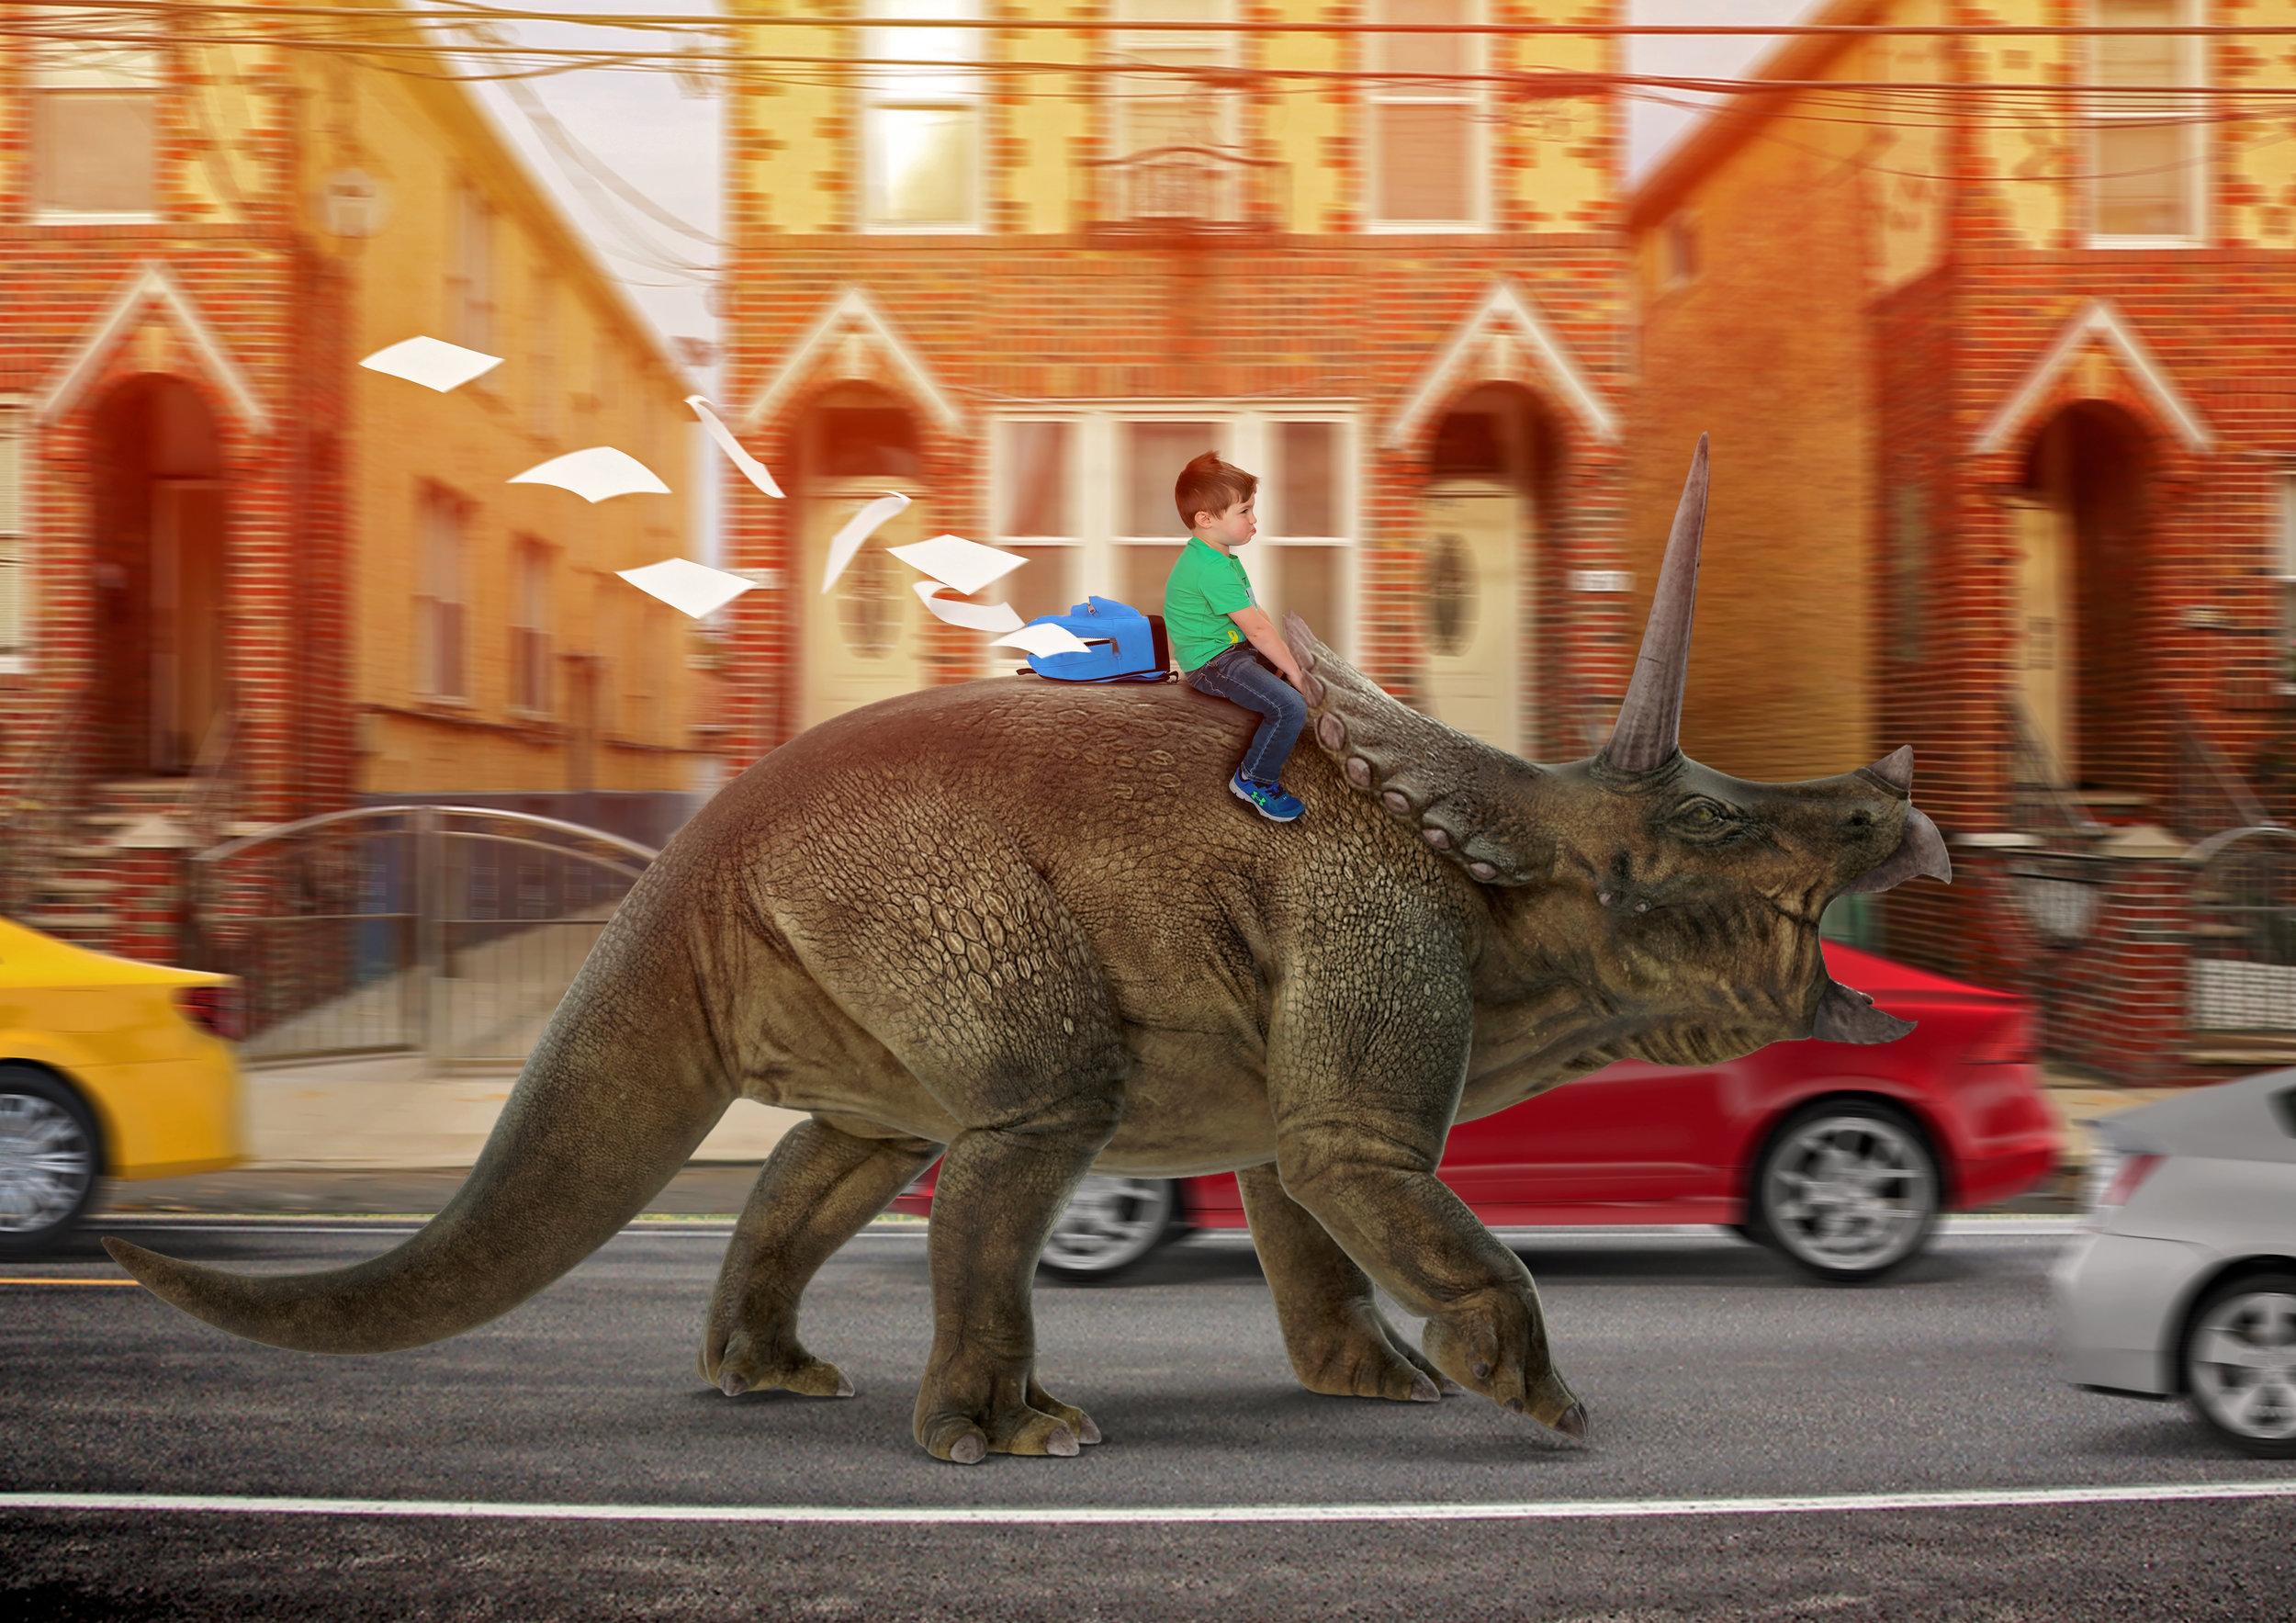 Dinoschoolbus.jpg